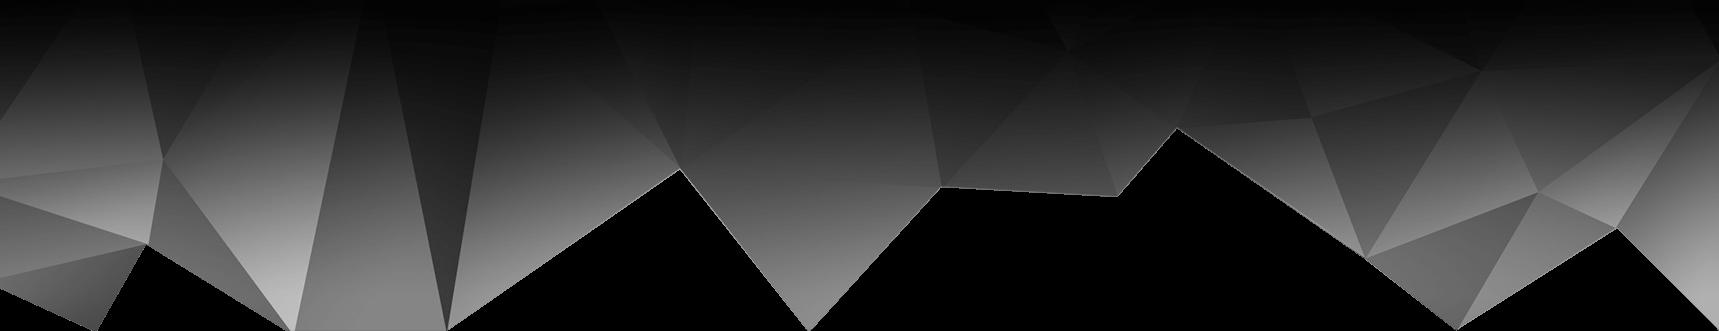 Polygon-Bg-Trenner